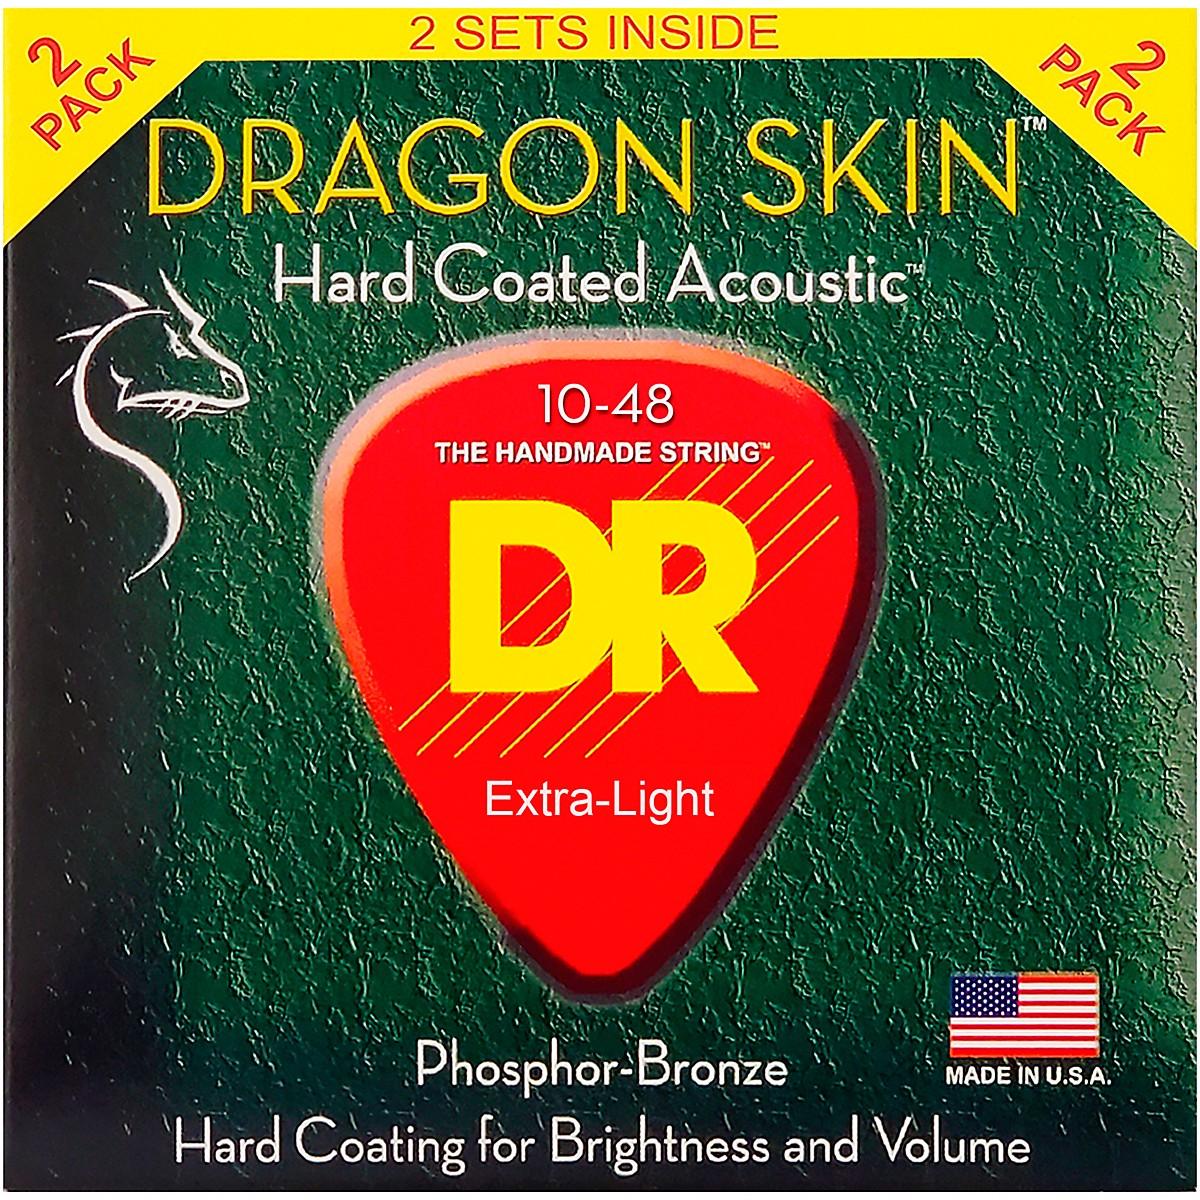 DR Strings Dragon Skin Clear Coated Phosphor Bronze Light Acoustic Guitar Strings (10-48) 2 Pack